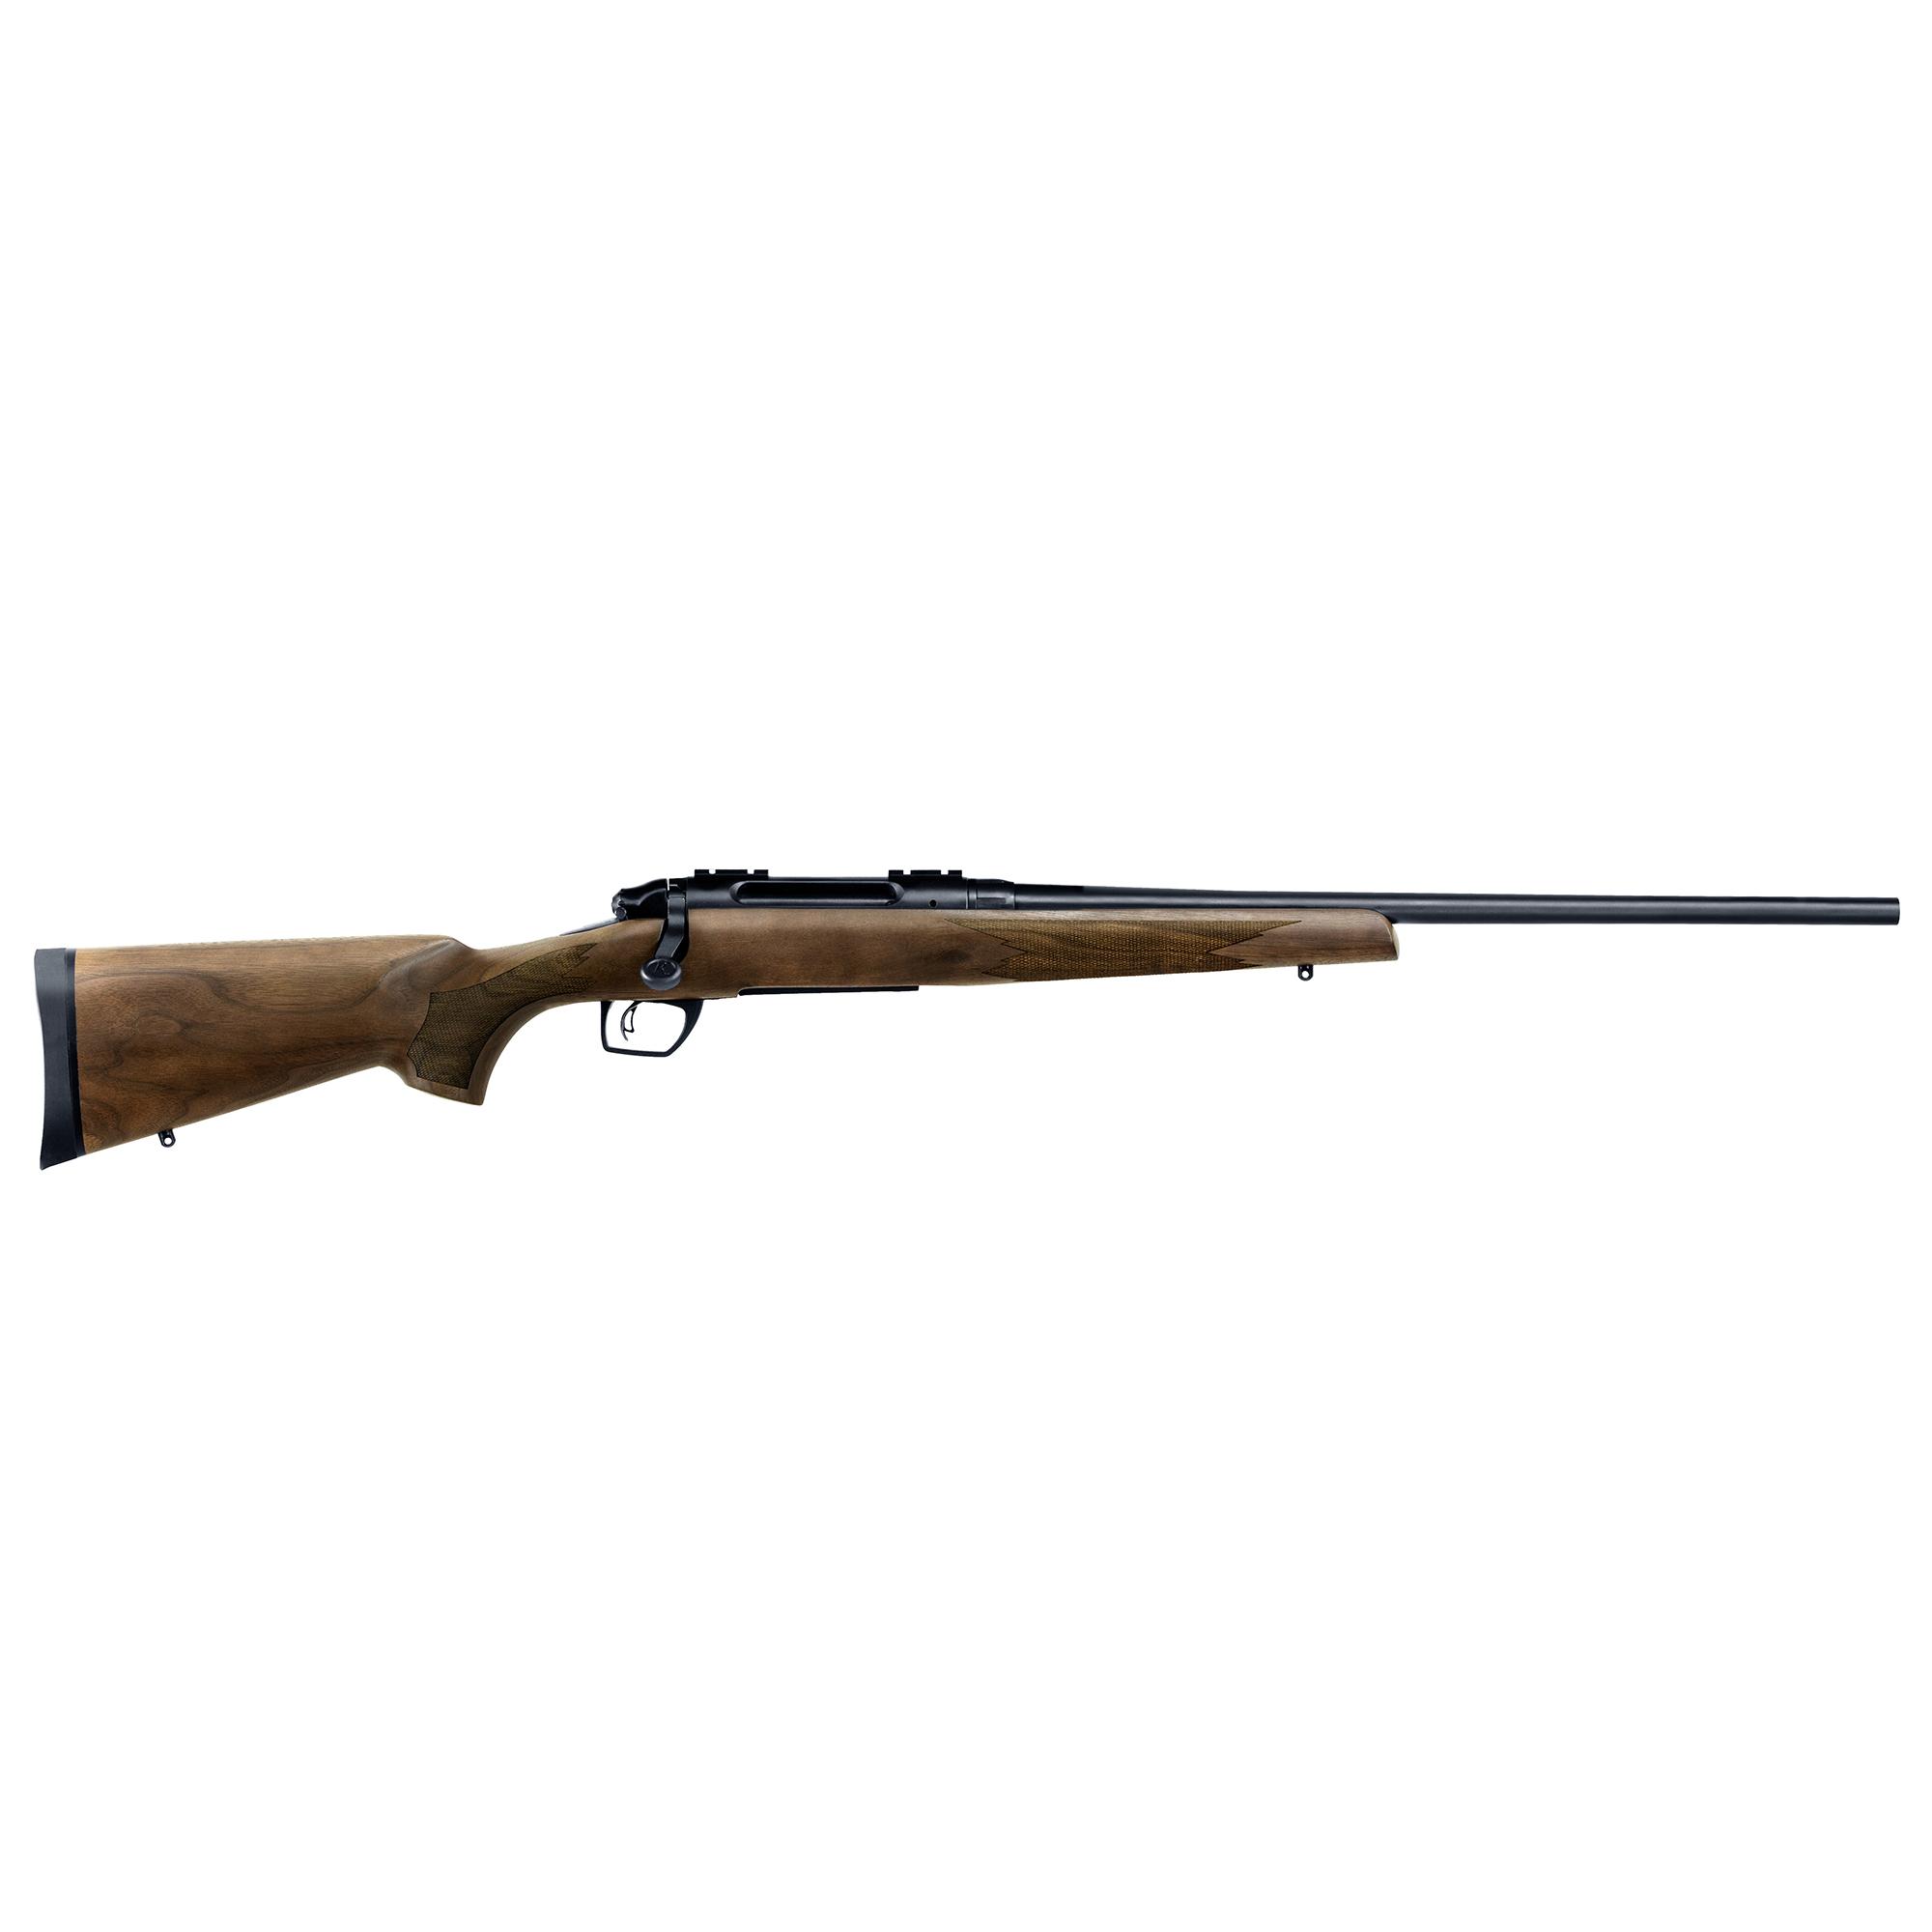 Remington Model 783 Walnut Centerfire Rifle, 7mm Rem. Mag.